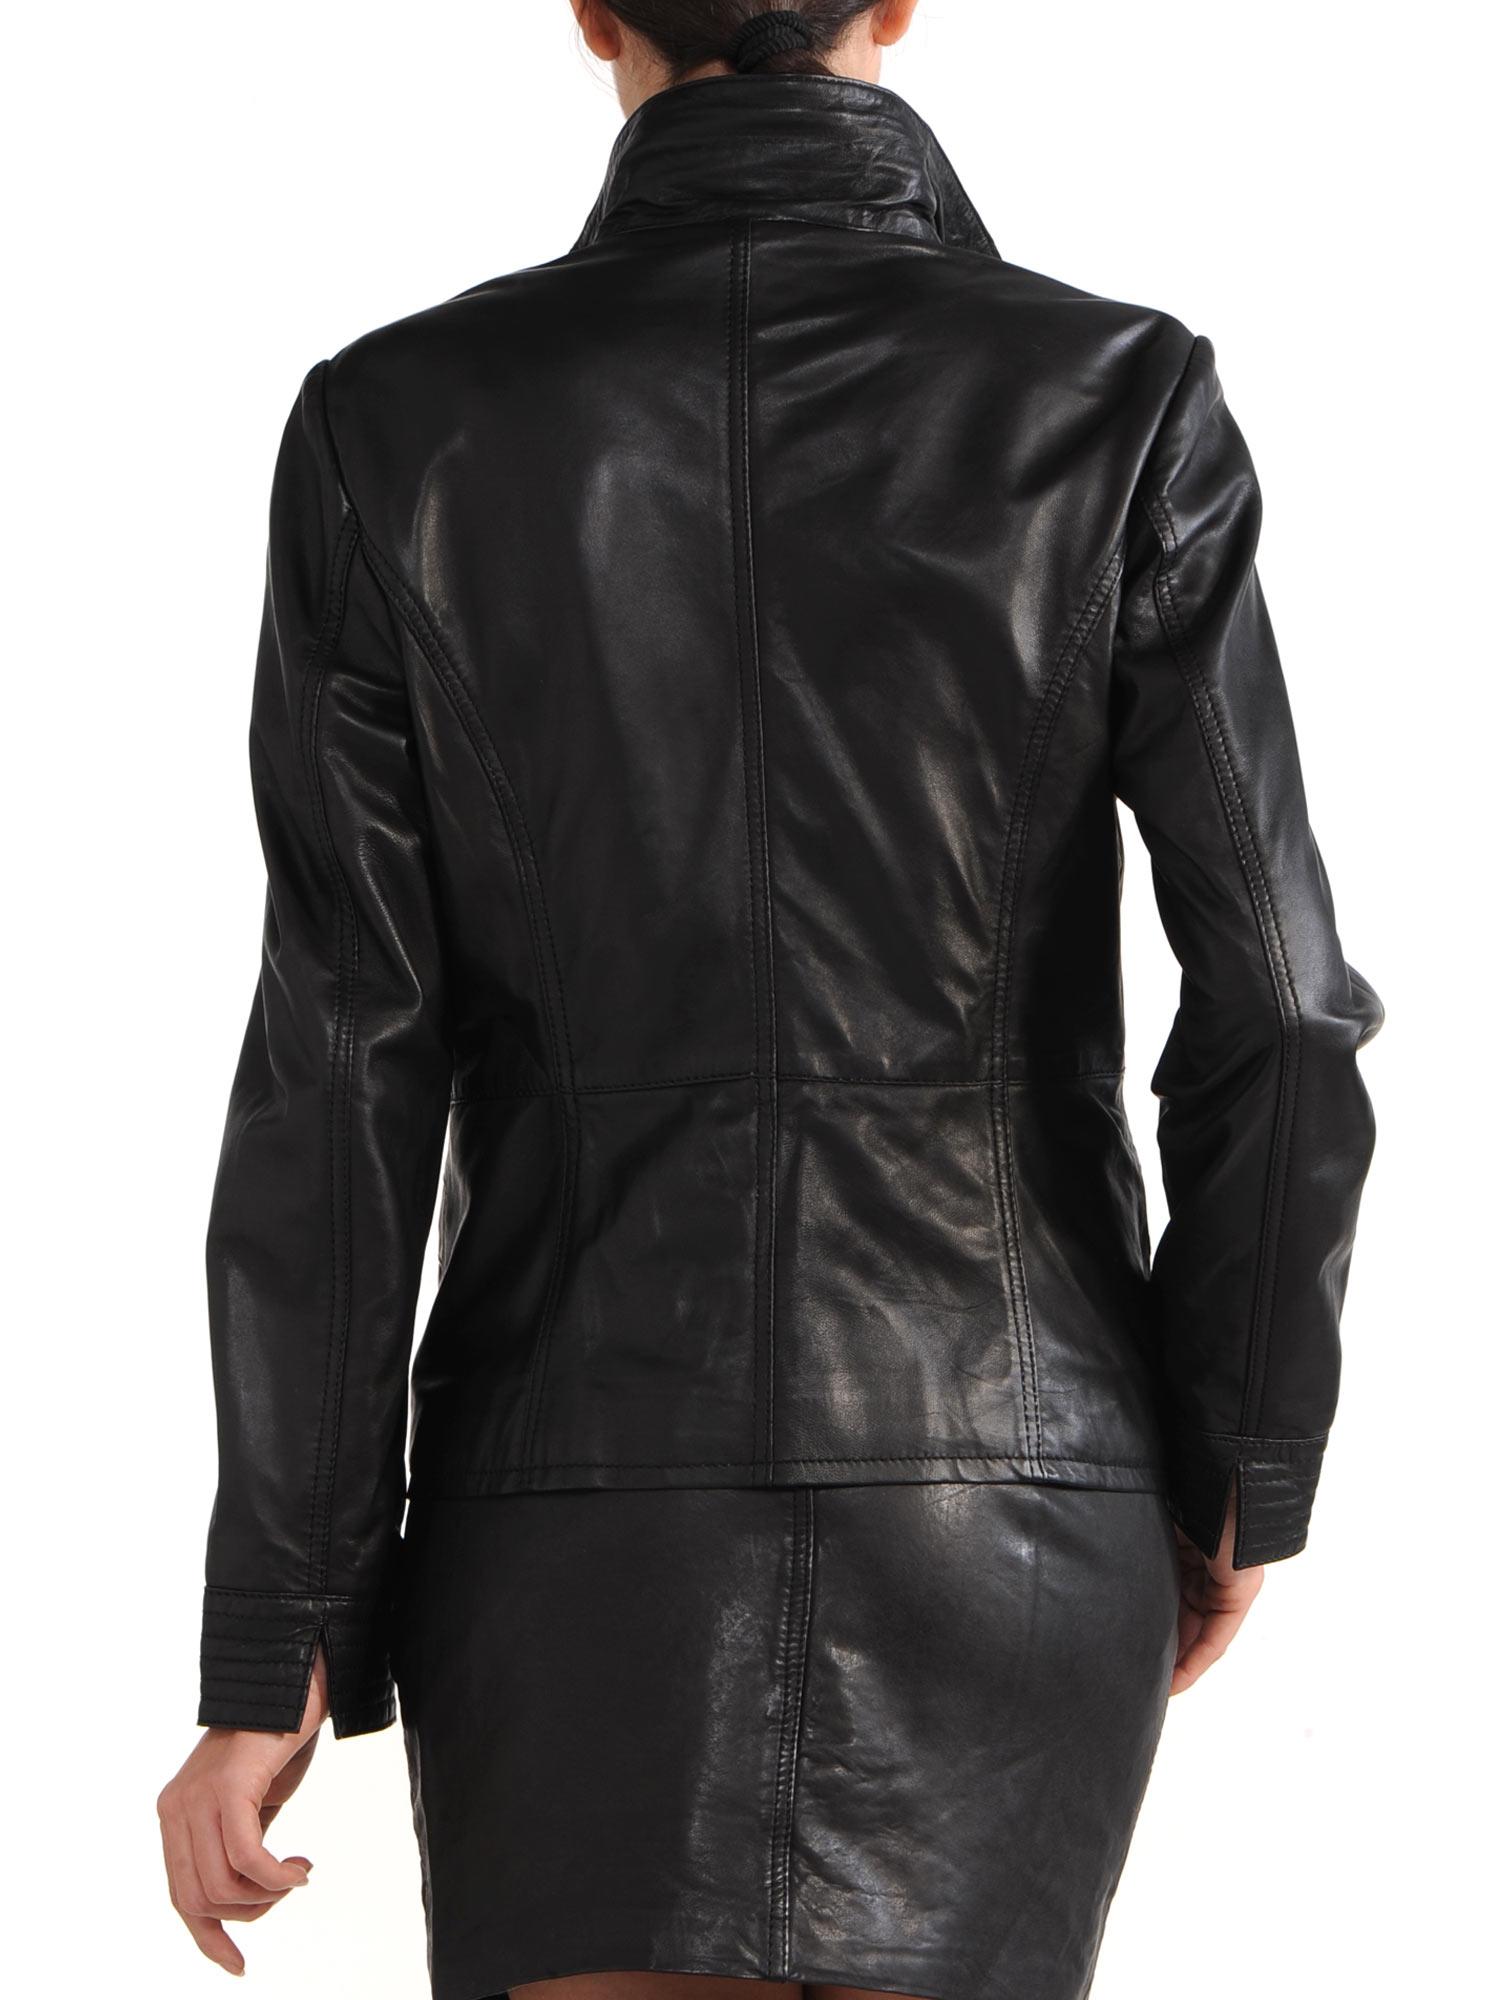 Avant Full Zipper Ladies Leather Jacket